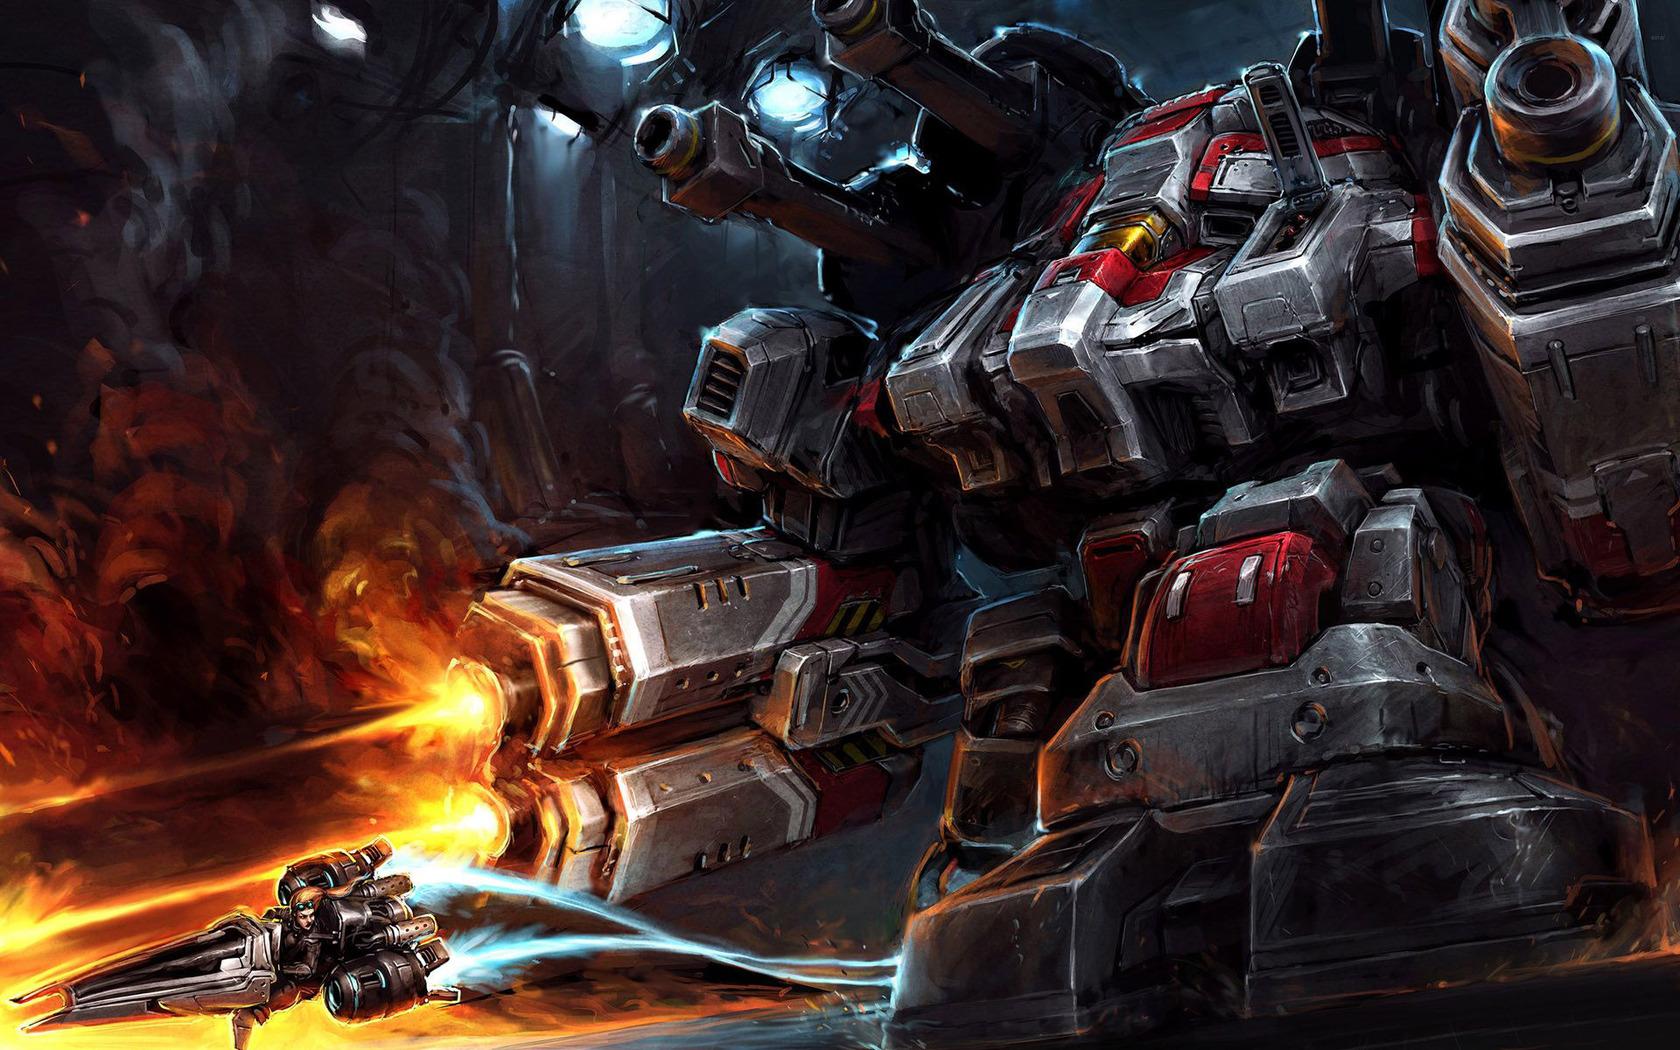 Thor   StarCraft II wallpaper 13947 1680x1050